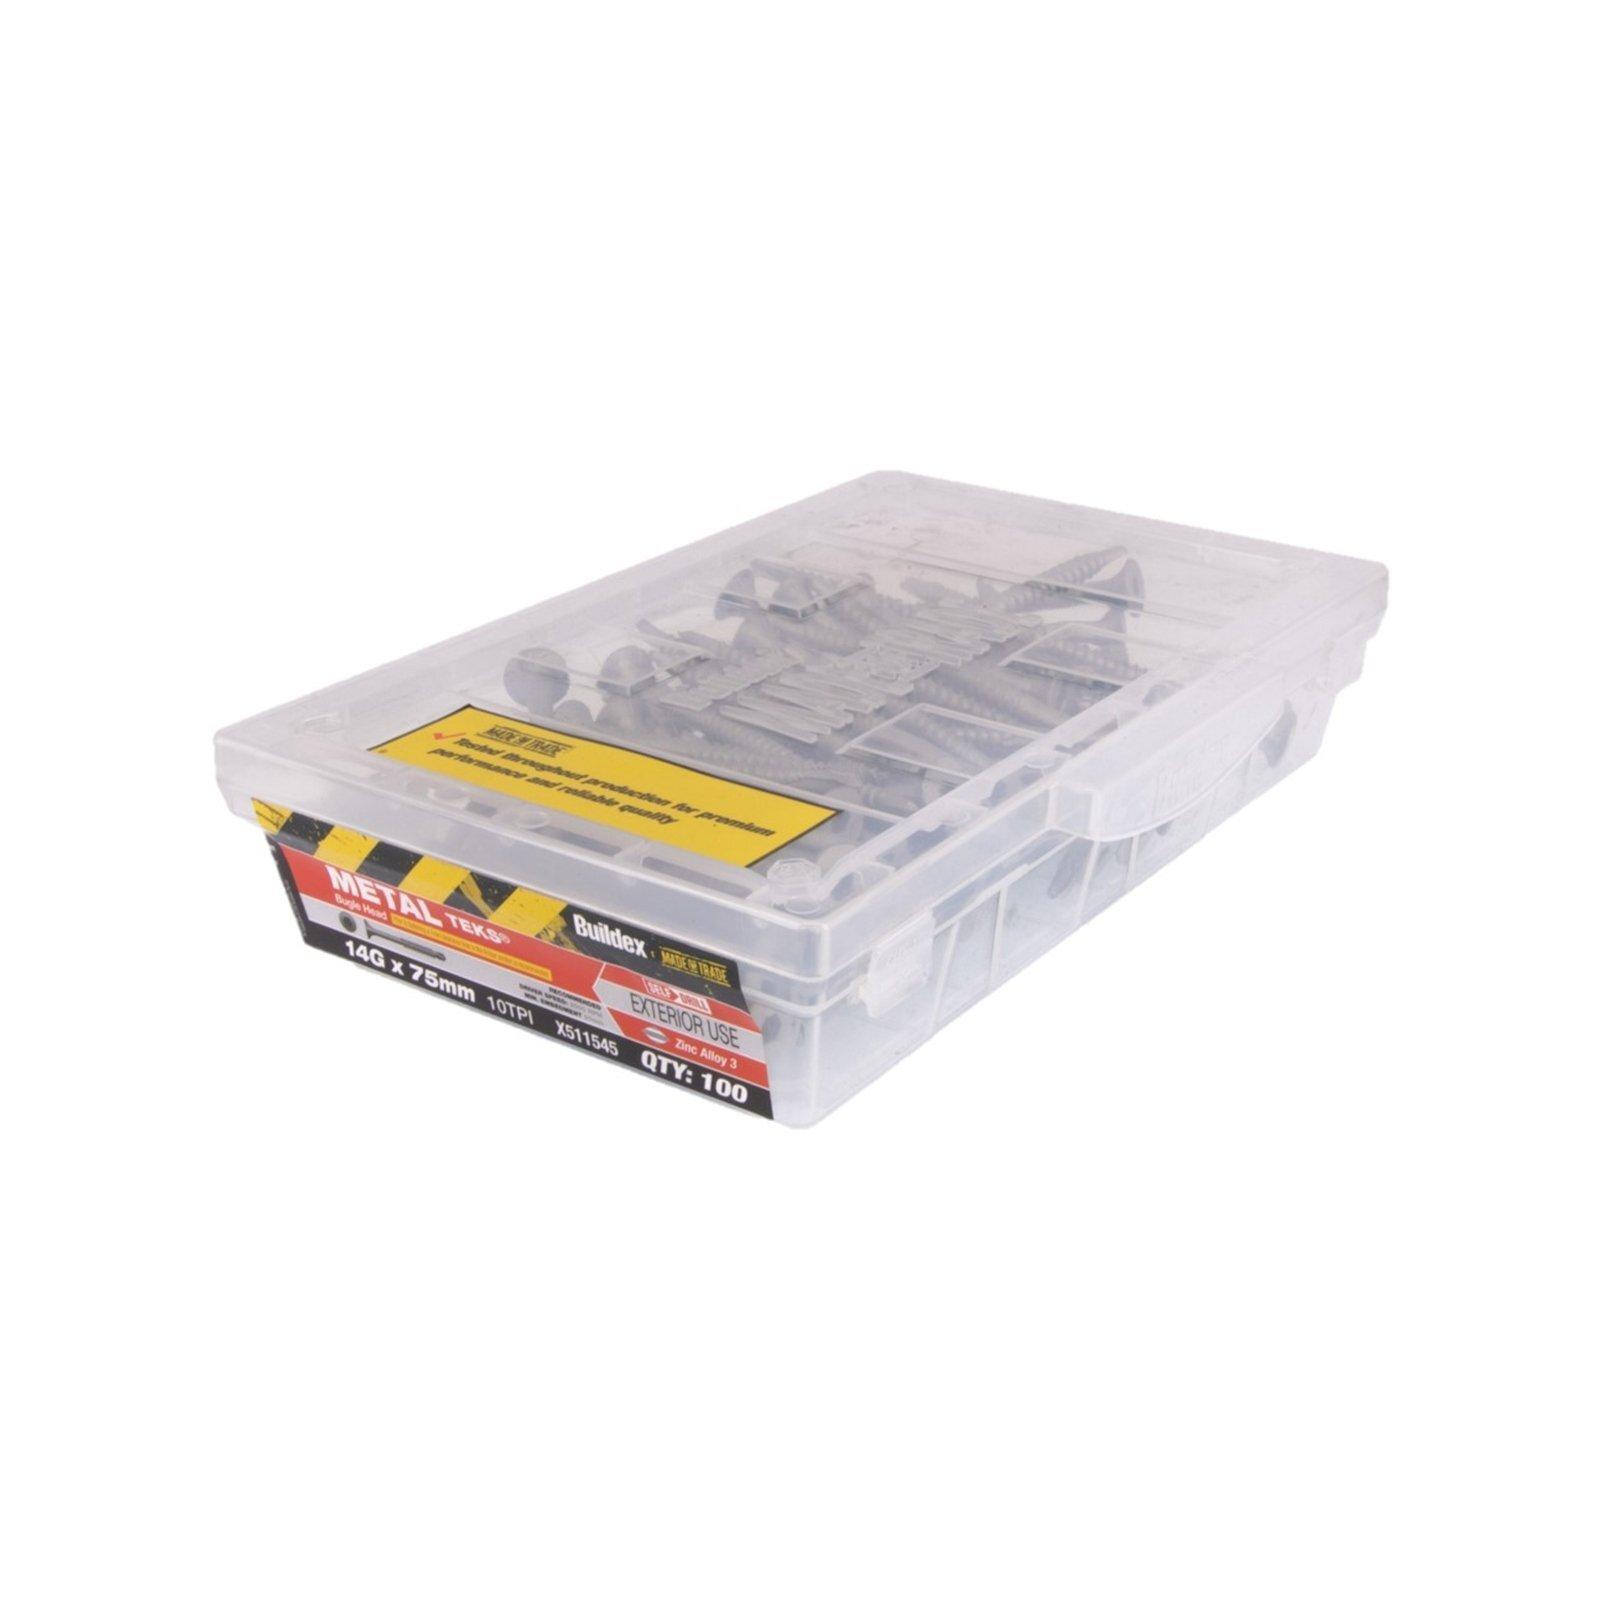 Buildex 14g x 75mm Zinc Alloy Bugle Batten Tek Screw - Box Of 100